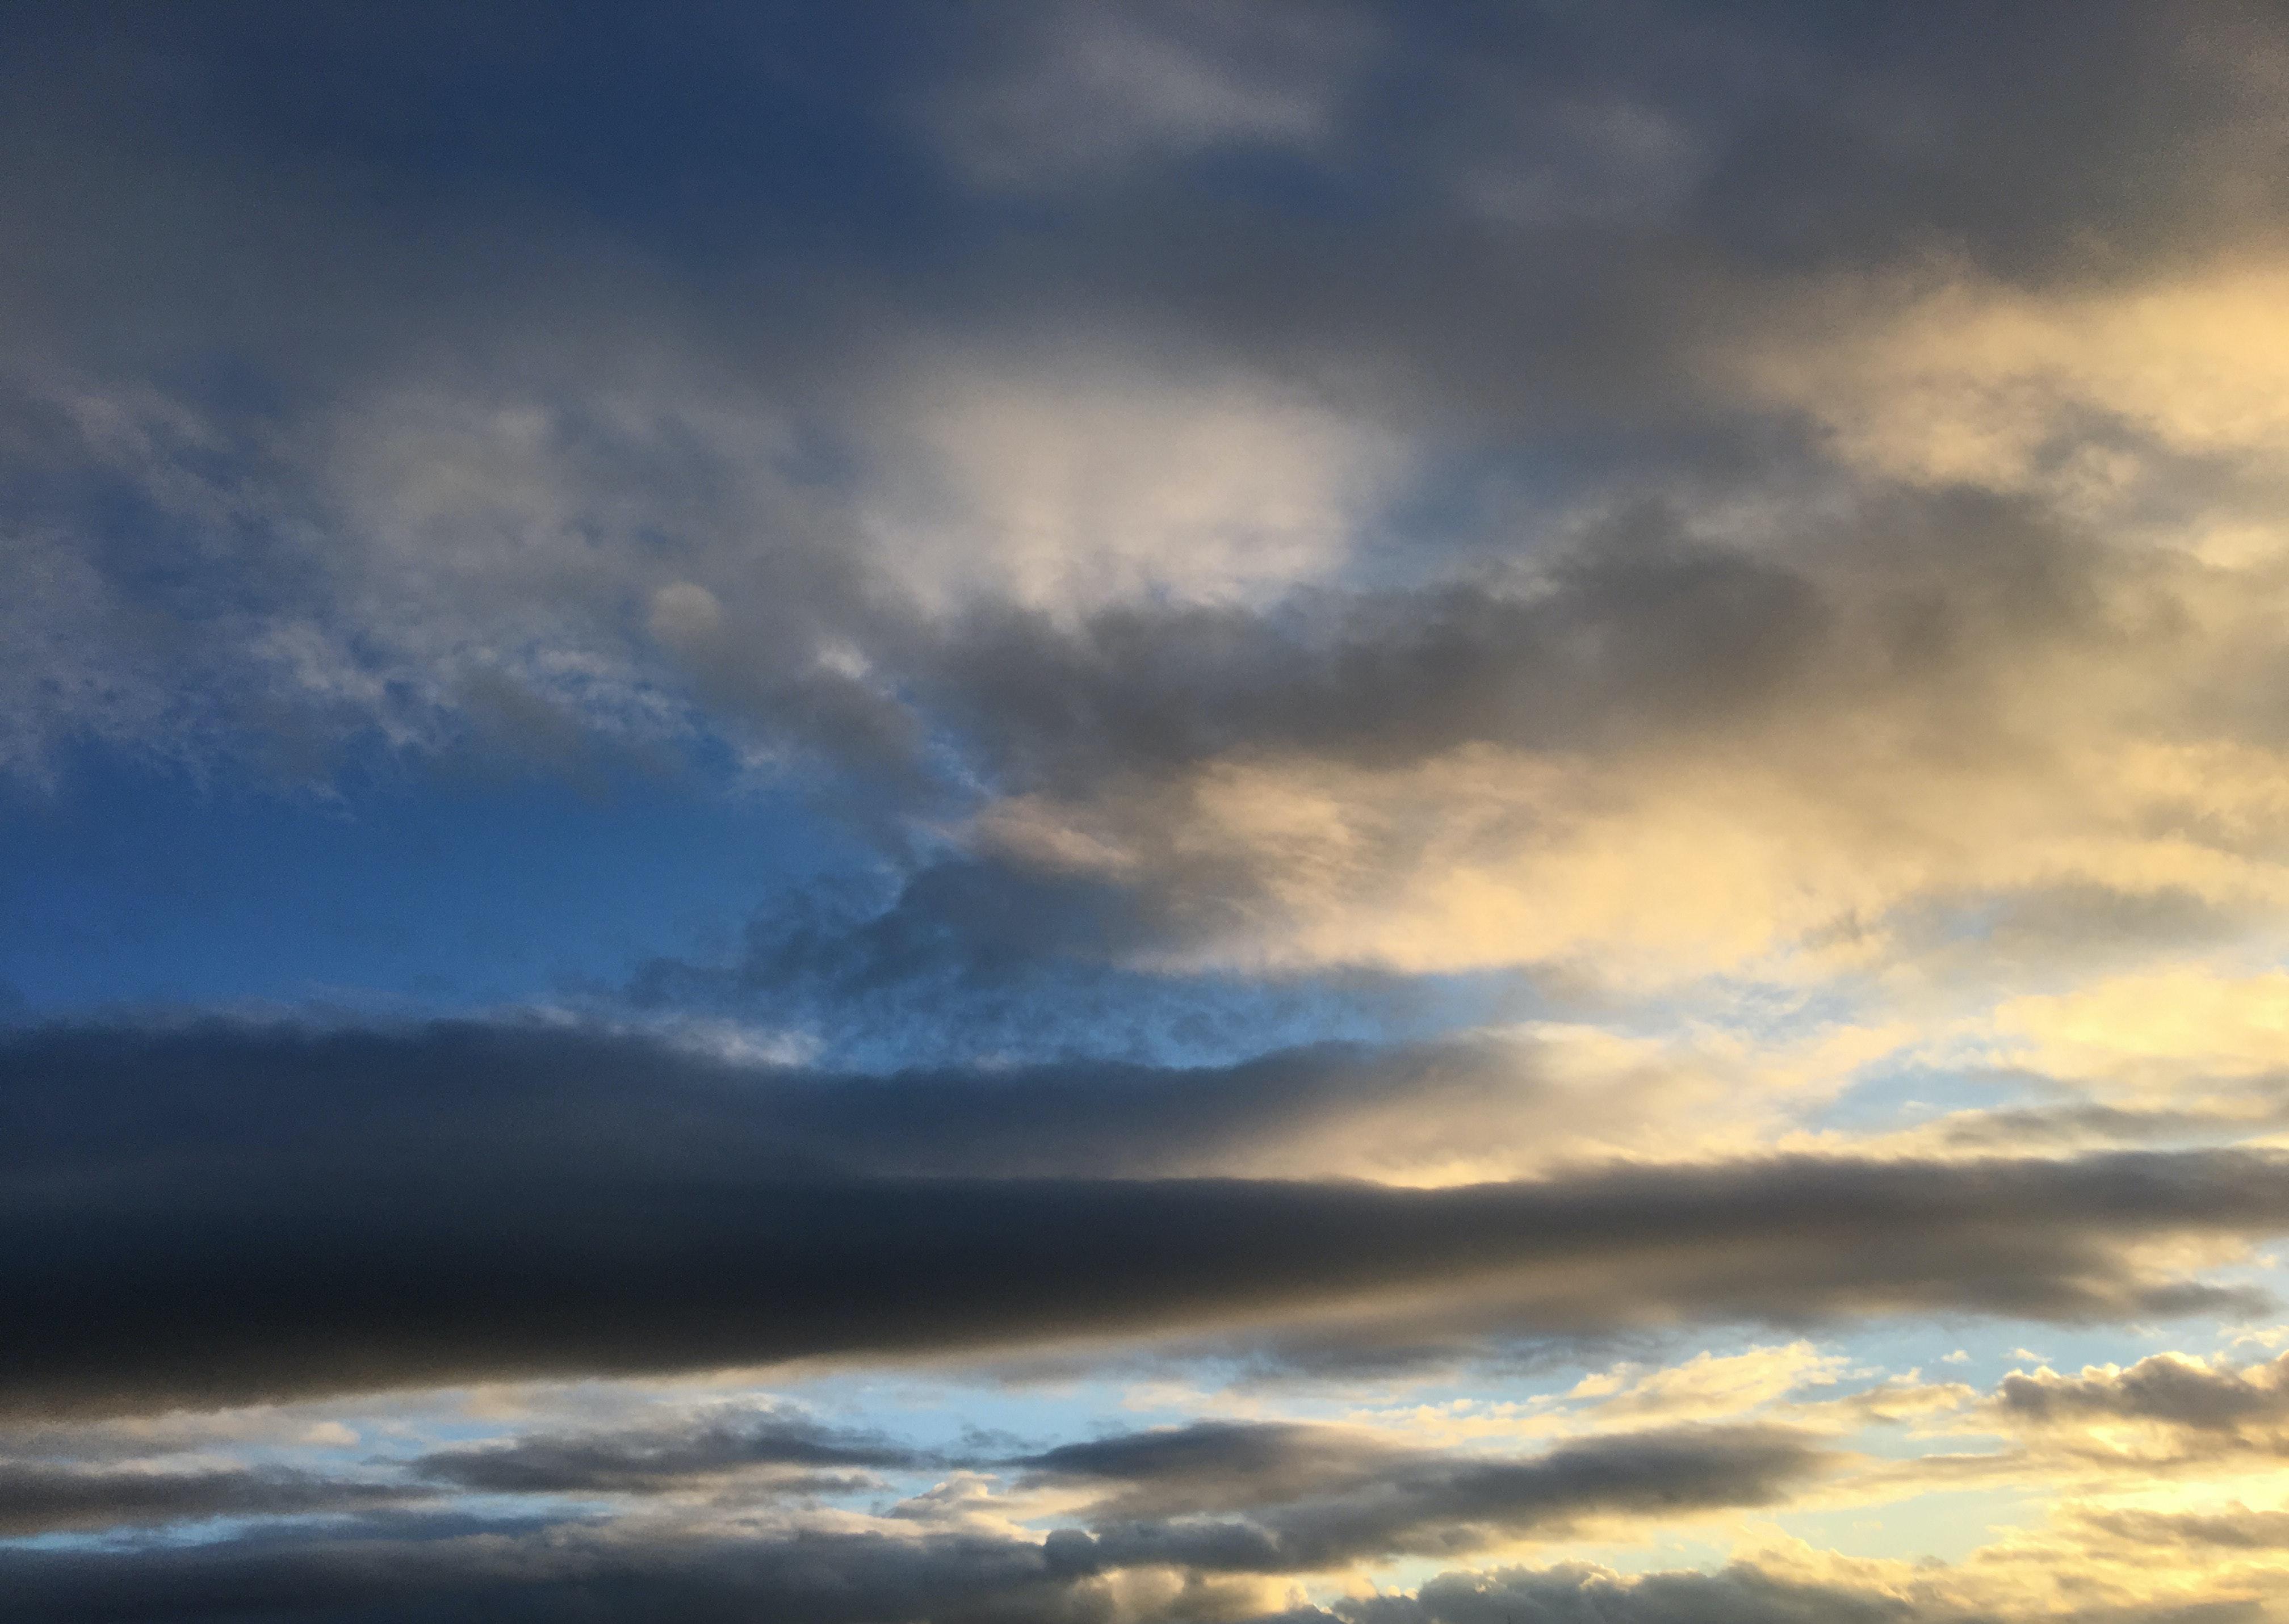 Foto de stock gratuita sobre cielo, cielo tormentoso, nubes